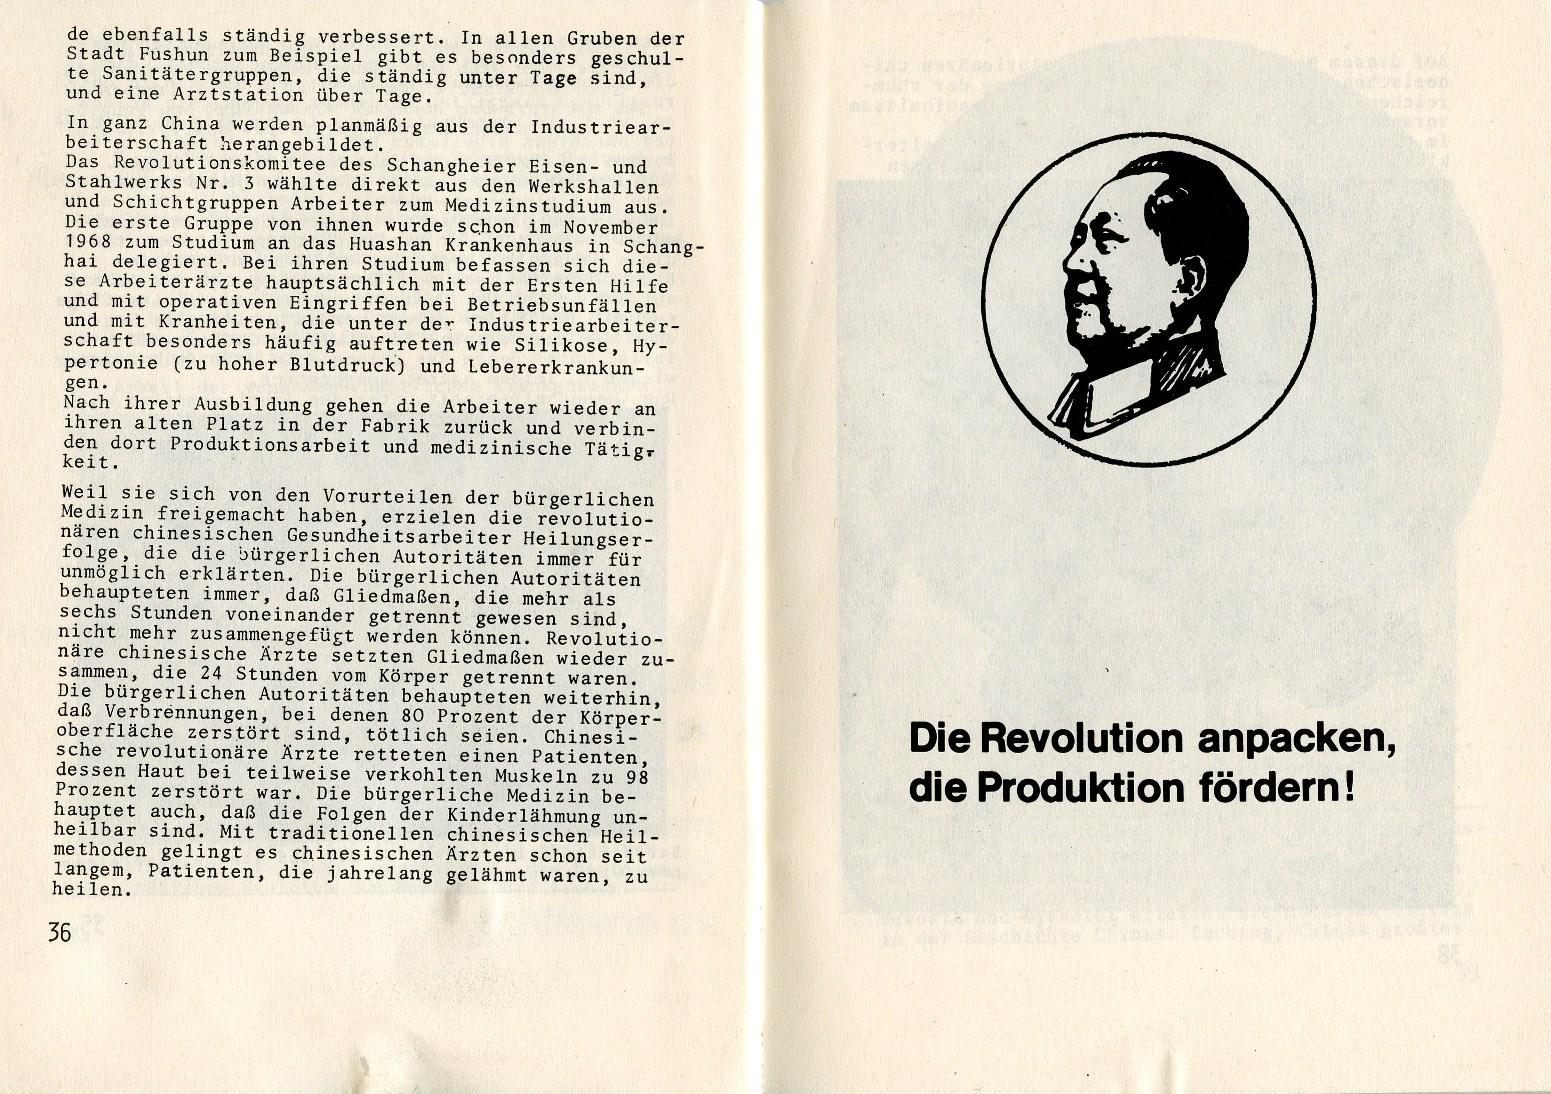 ZB_KPChinas_1971_20